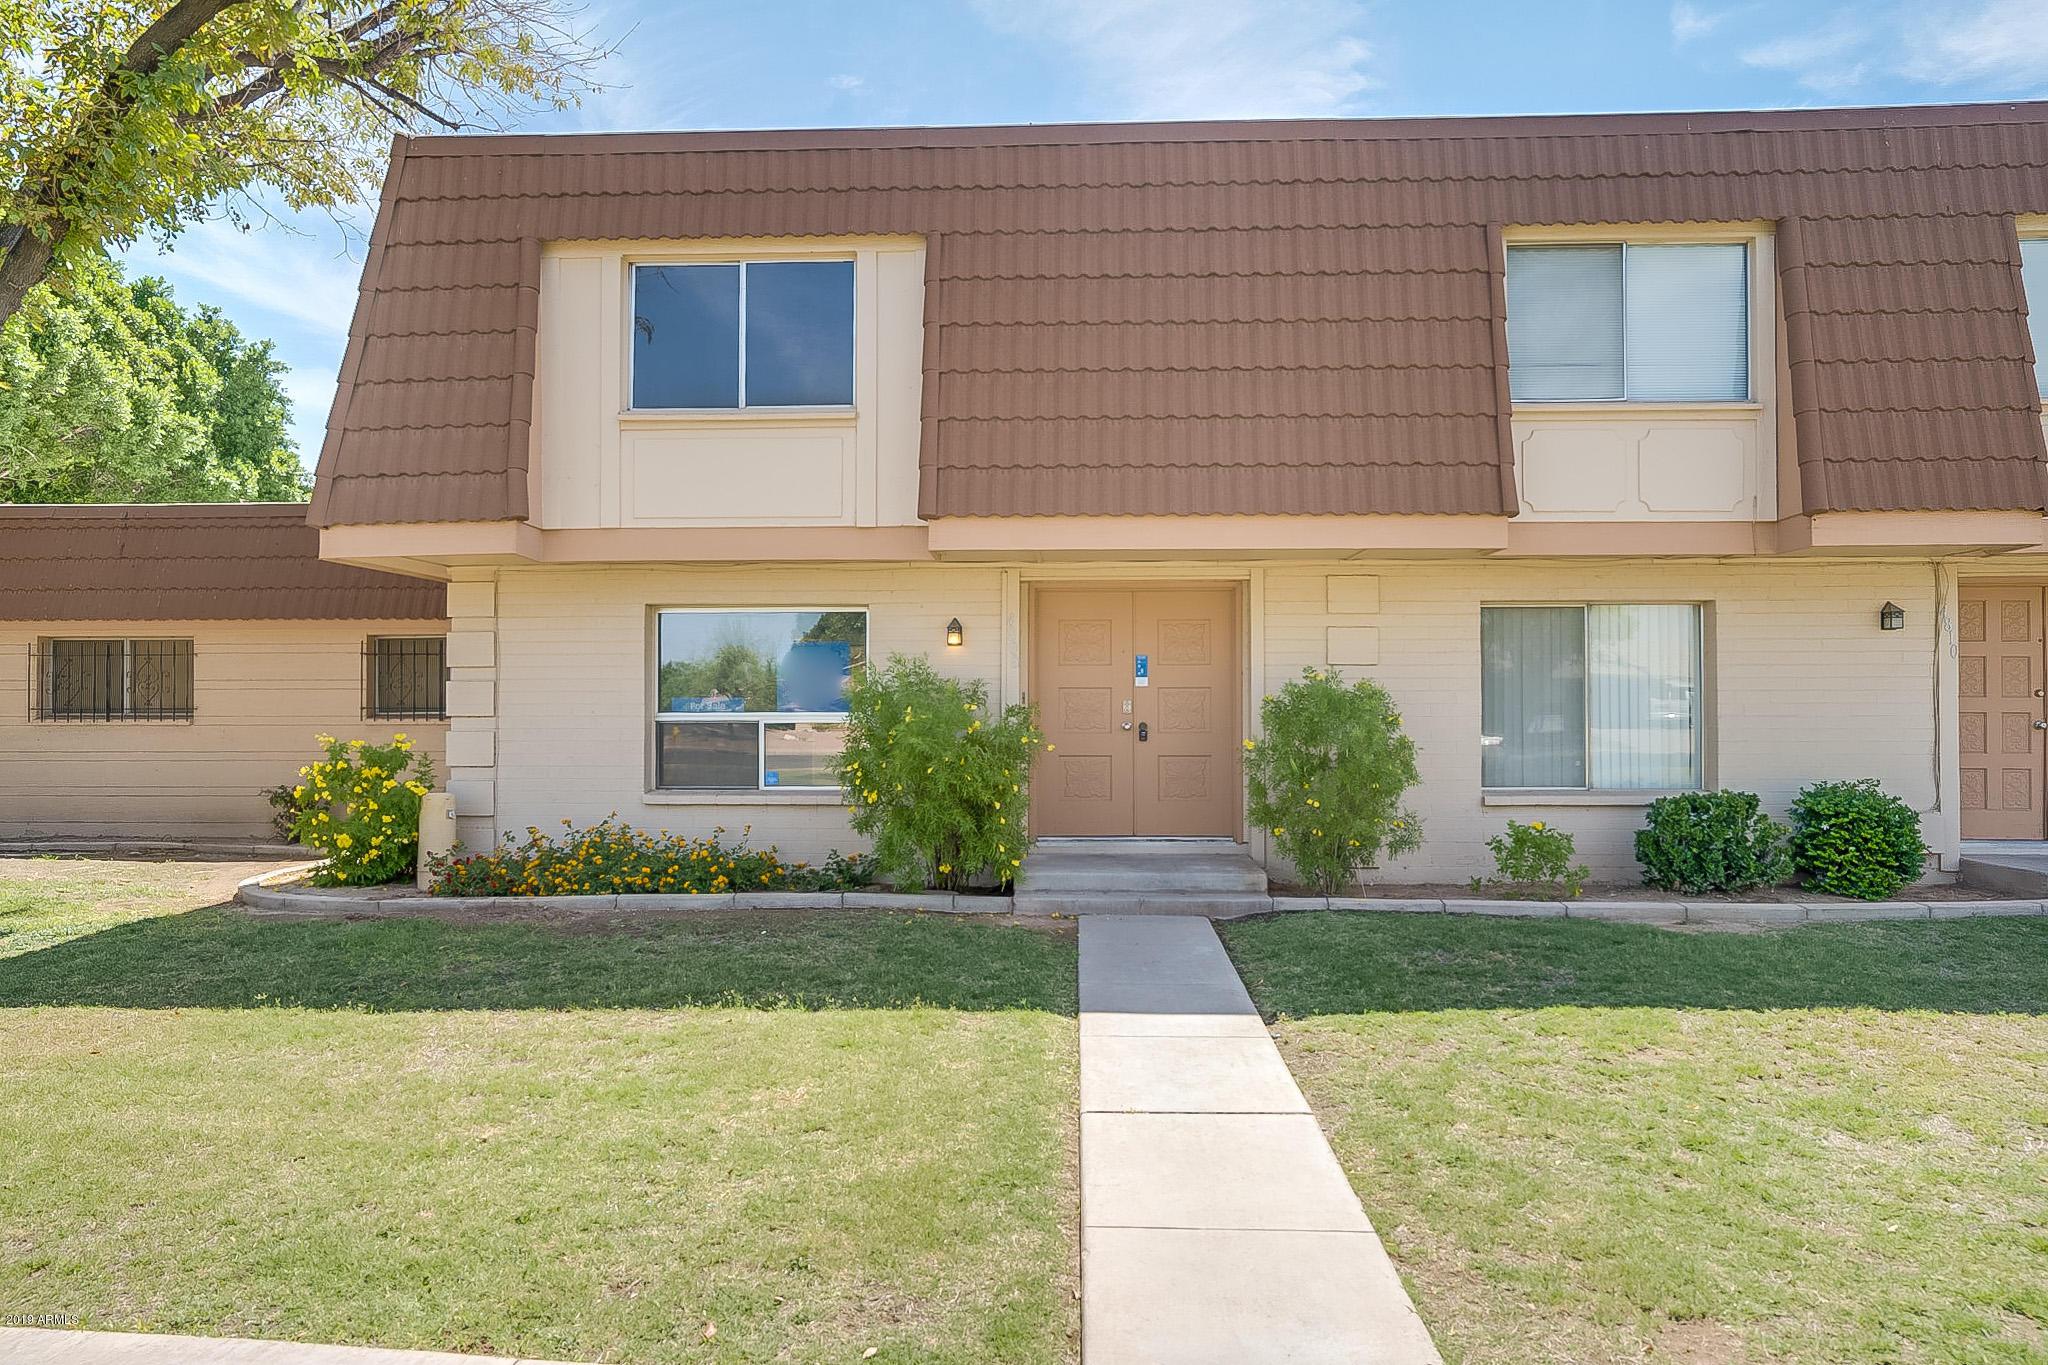 Photo of 4808 S BIRCH Street, Tempe, AZ 85282